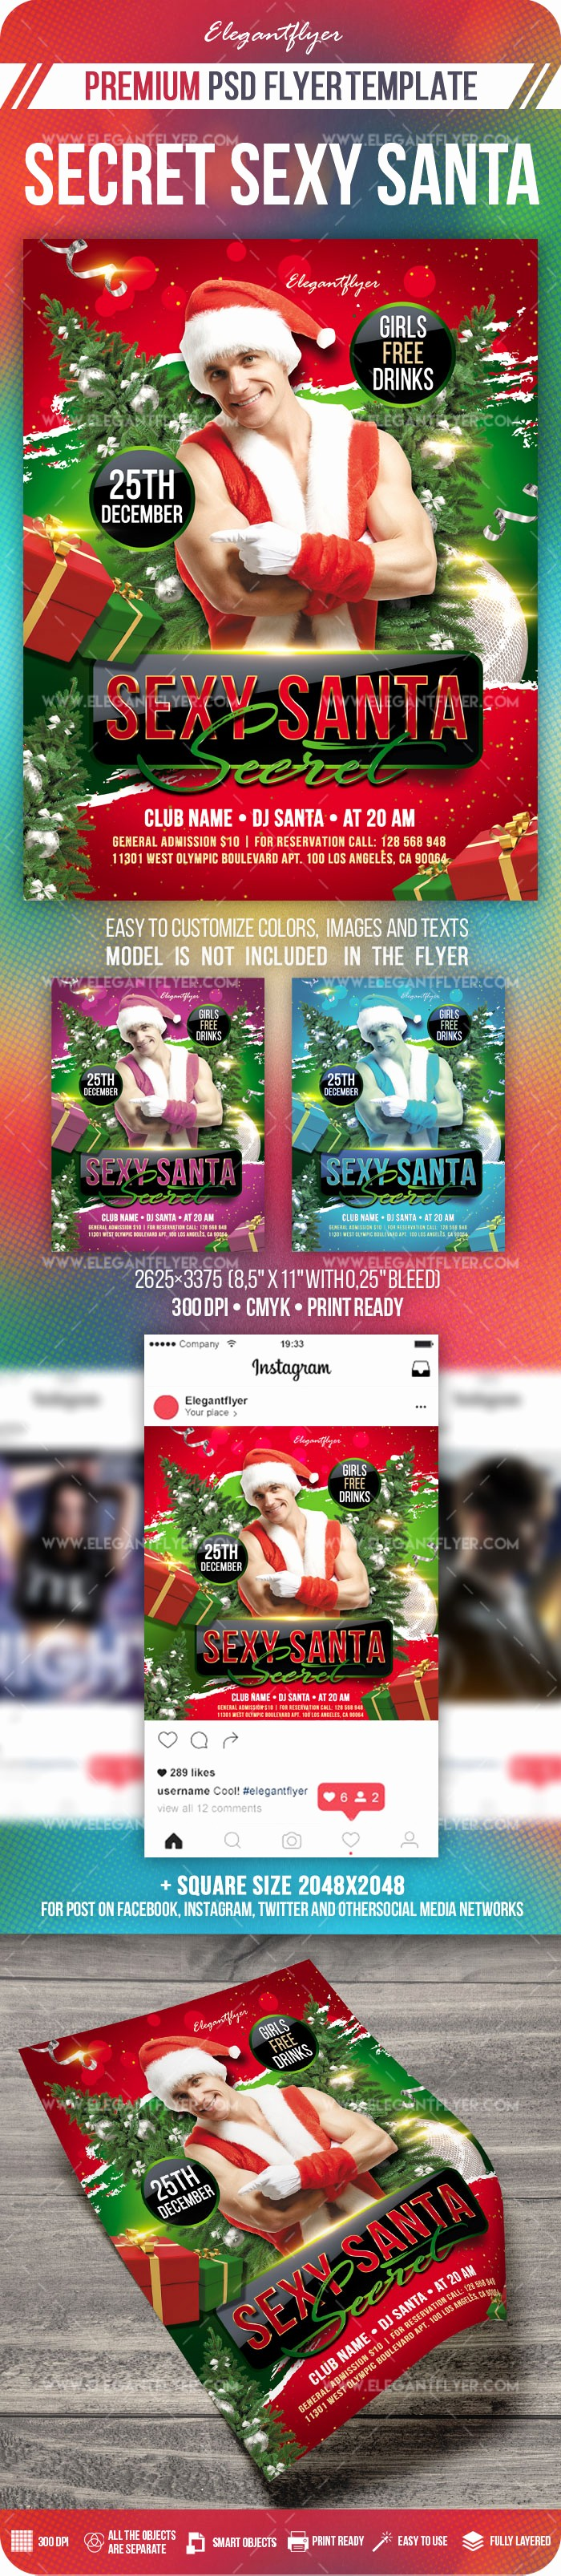 Free Secret Santa Flyer Templates Best Of Secret Y Santa – Flyer Psd Template Instagram